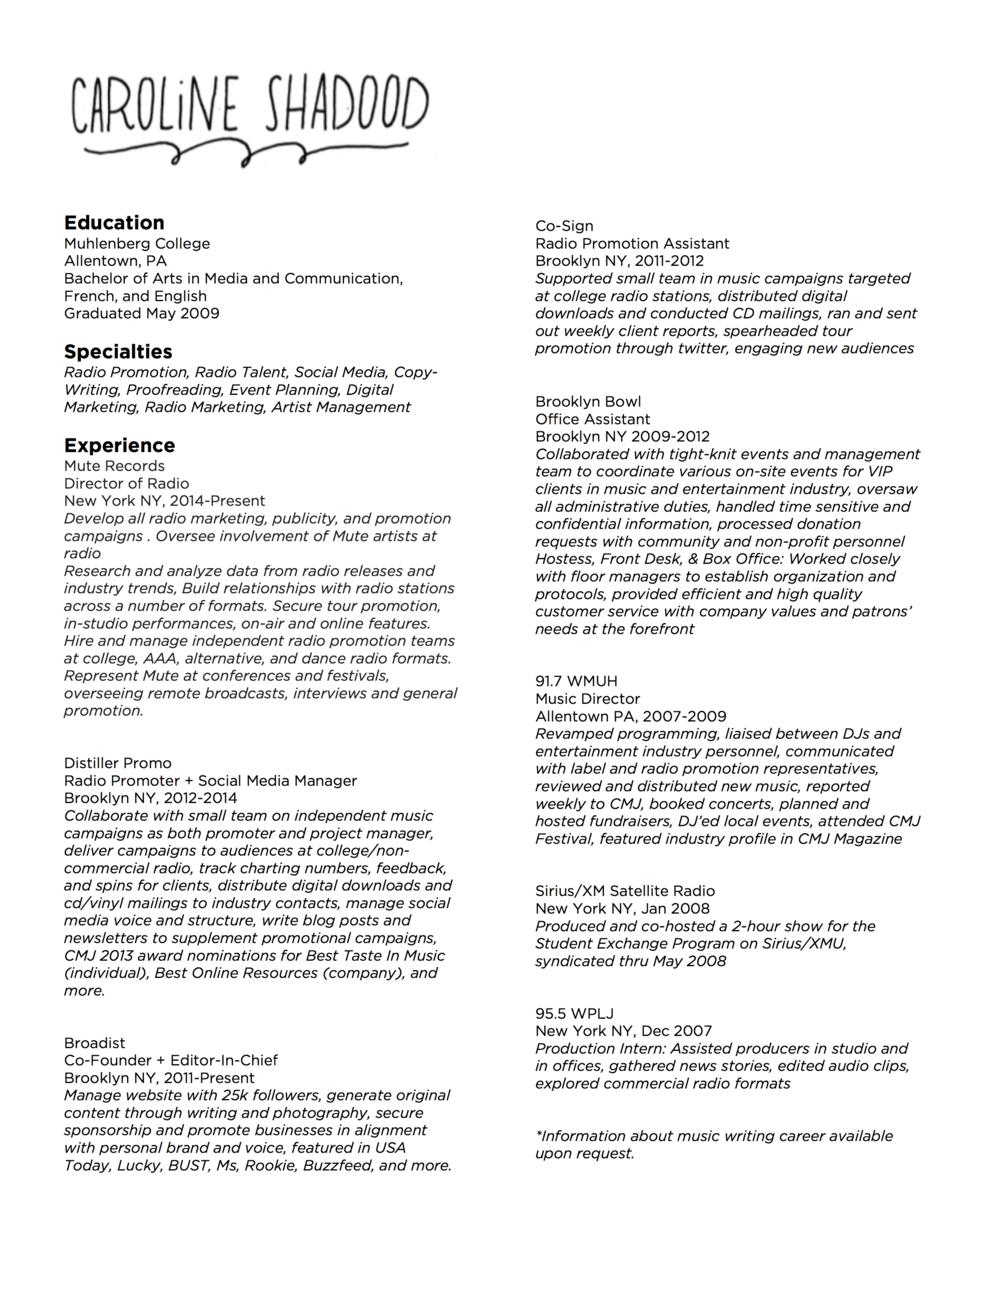 Resume — Caroline Shadood